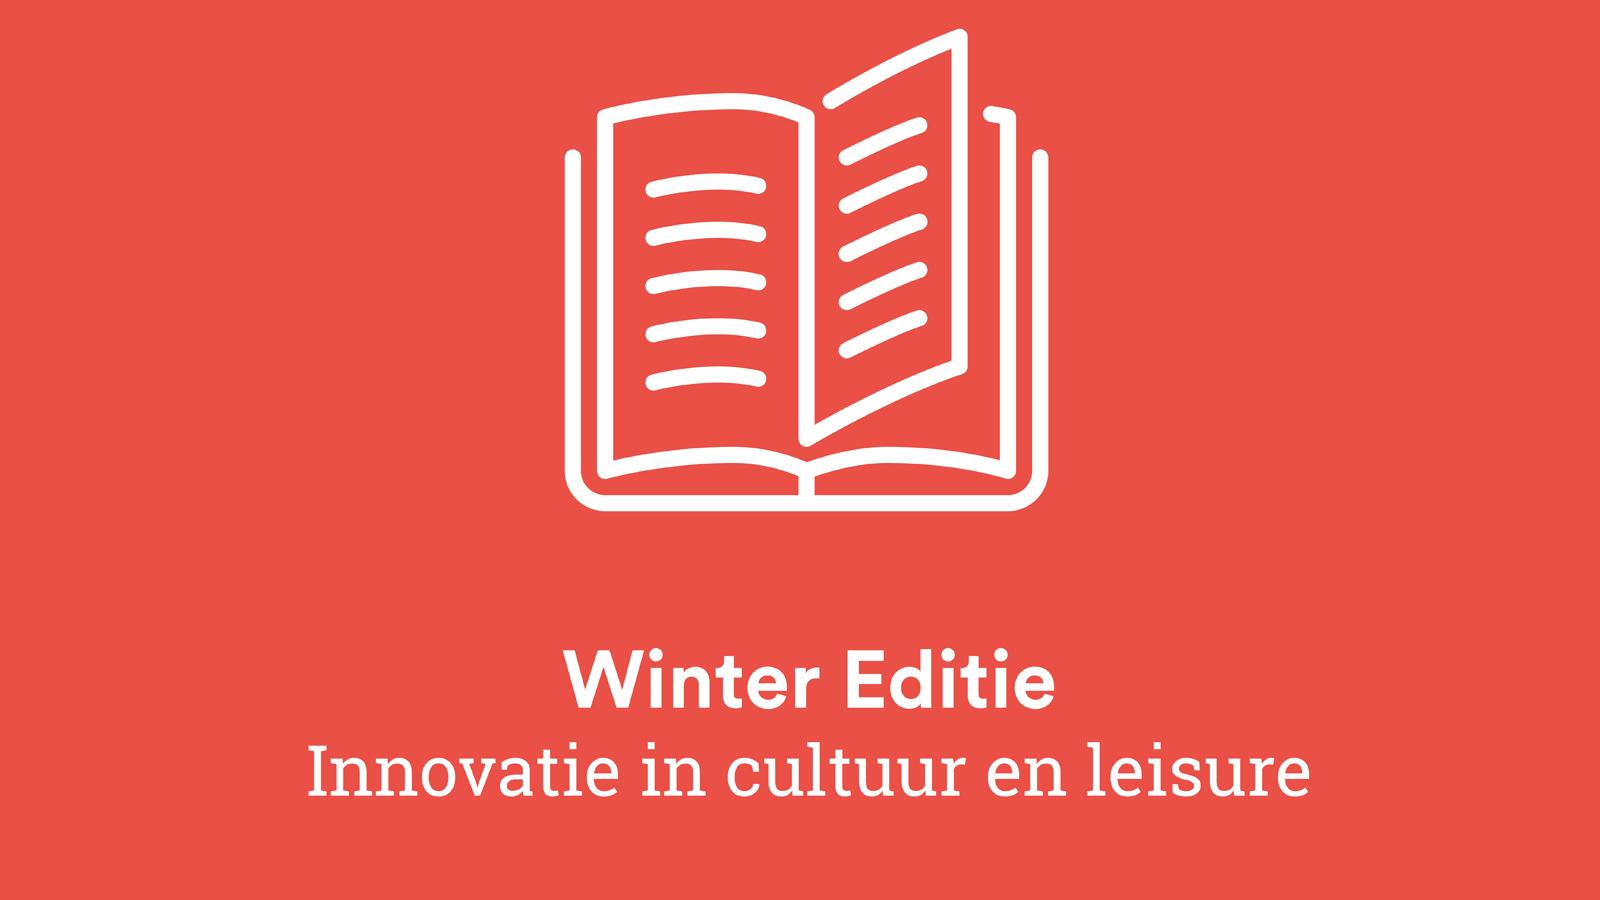 Winter Editie: Innovatie in Cultuur & Leisure